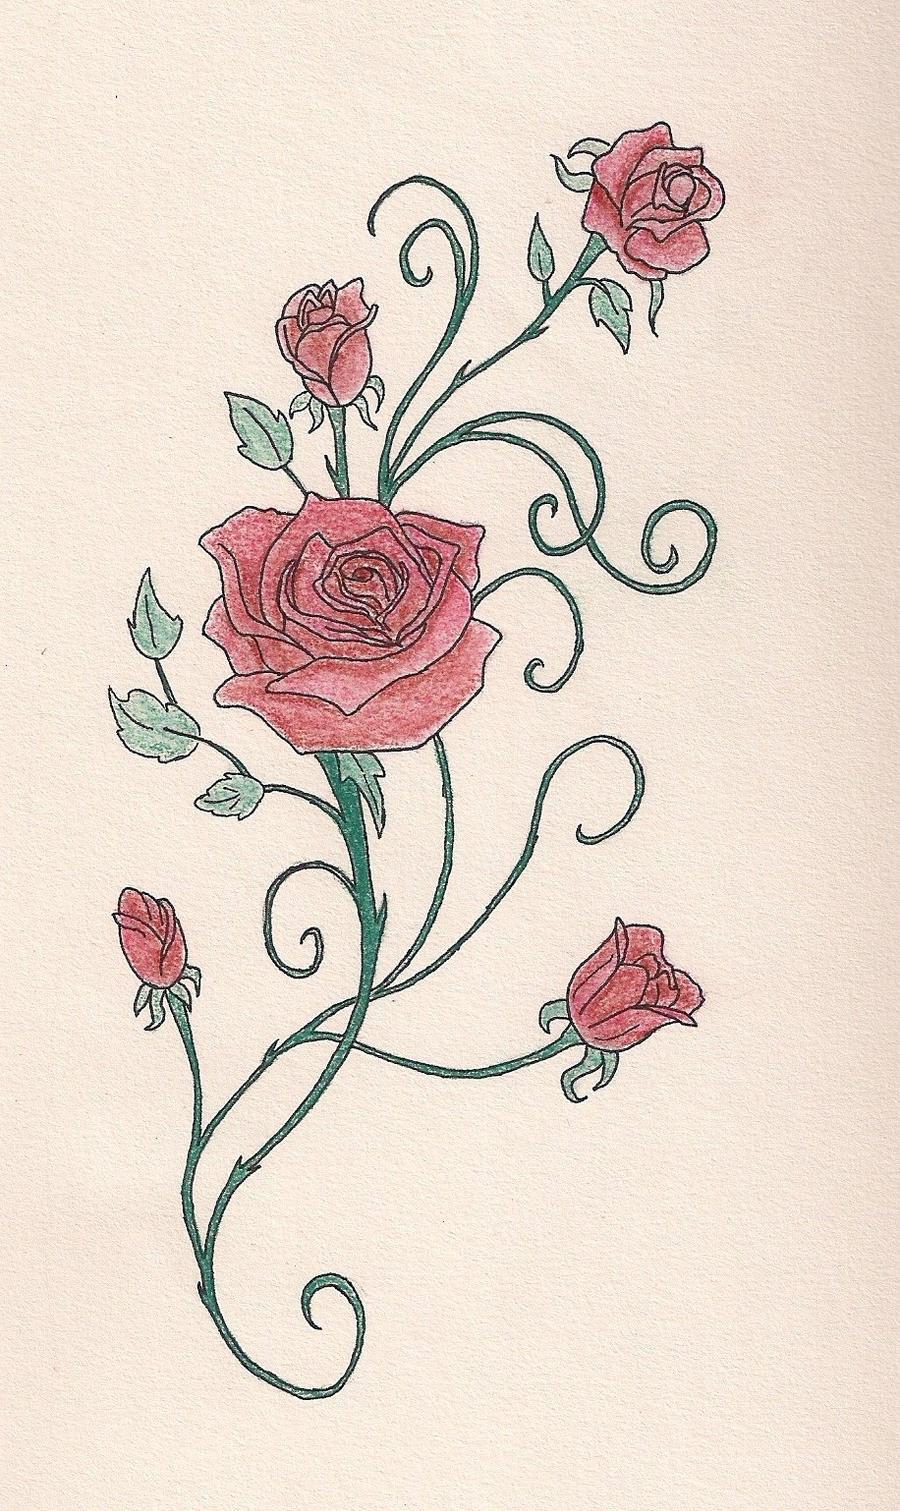 rose vine with pastels by a quily on deviantart. Black Bedroom Furniture Sets. Home Design Ideas